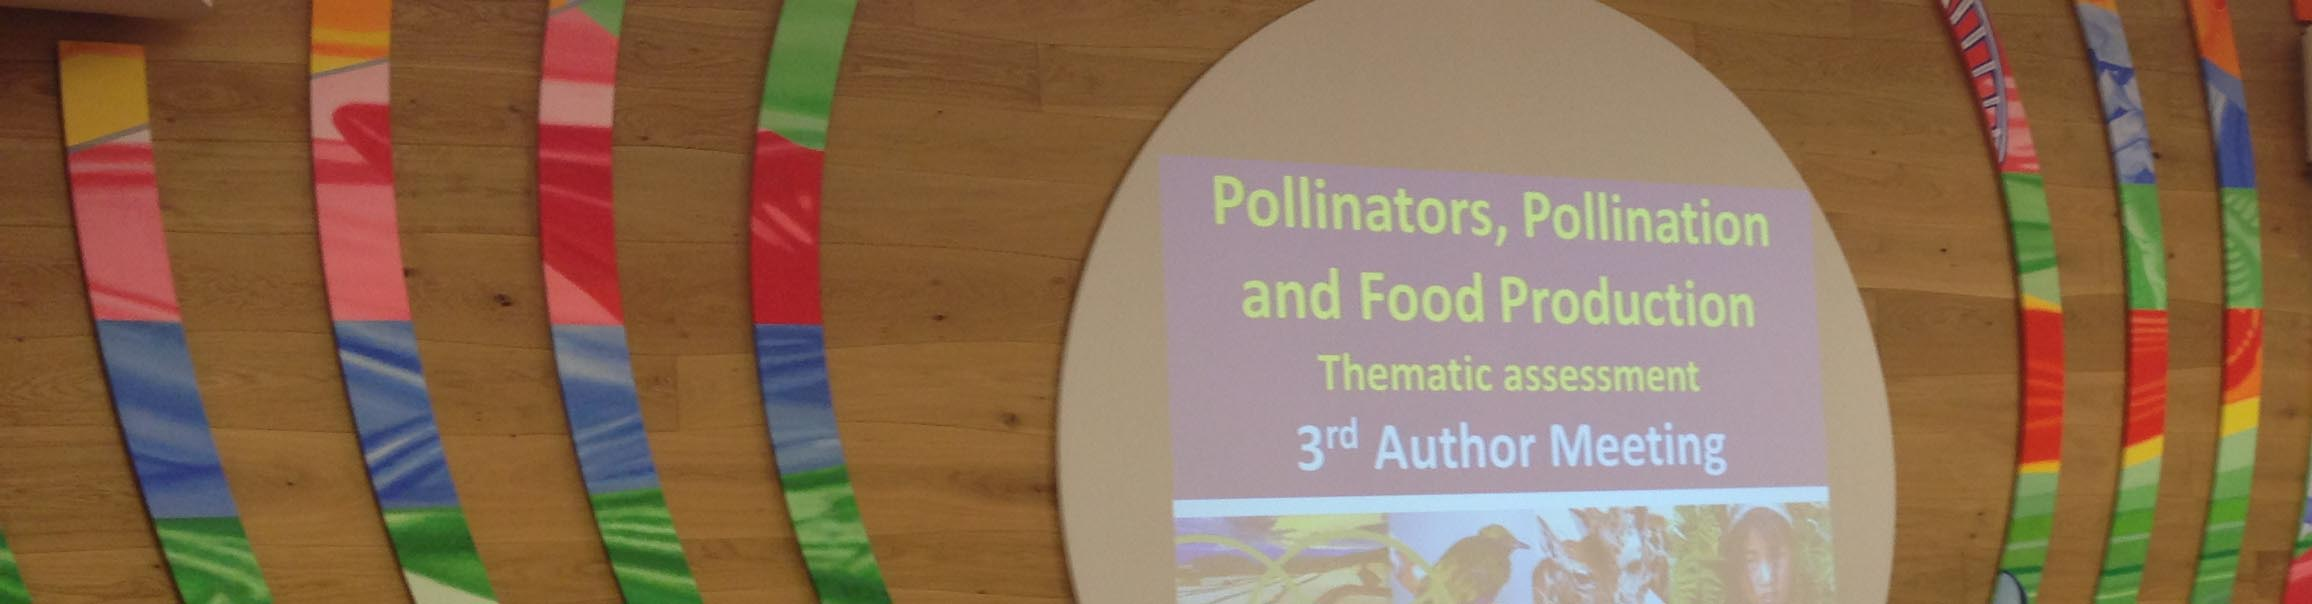 header-pollinators